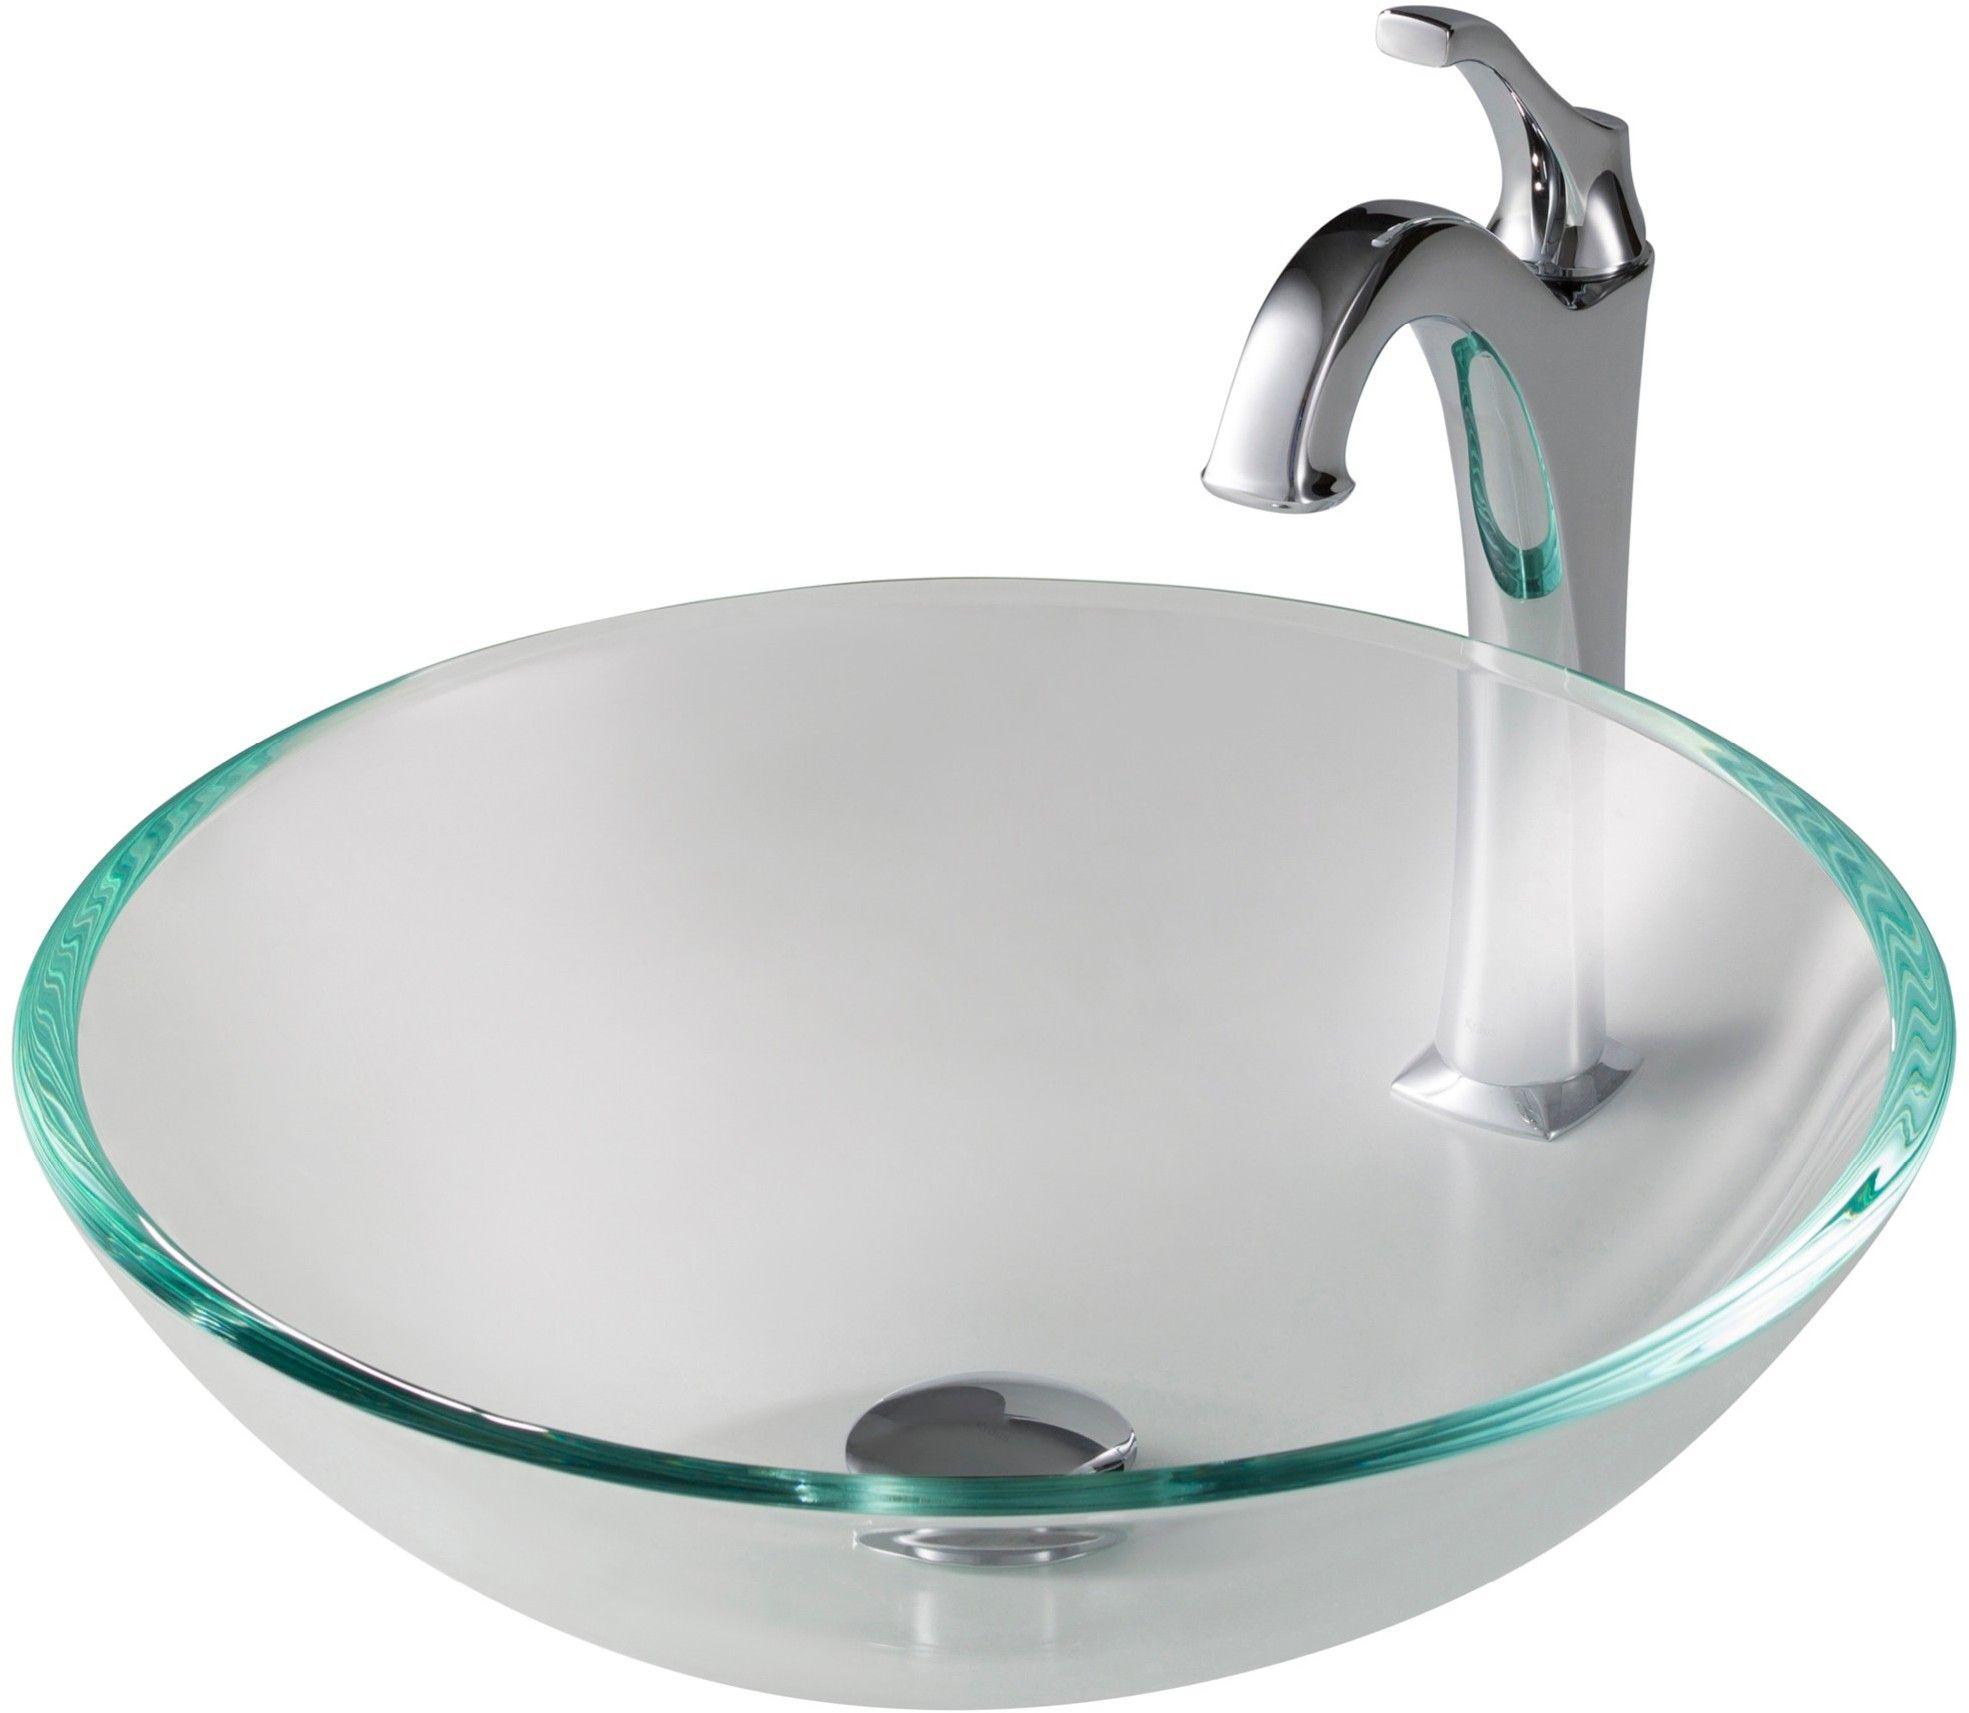 Kraus Single Tone Sink Faucet Combination Clear Cgv10012mm1200ch Glass Sink Sink Faucet